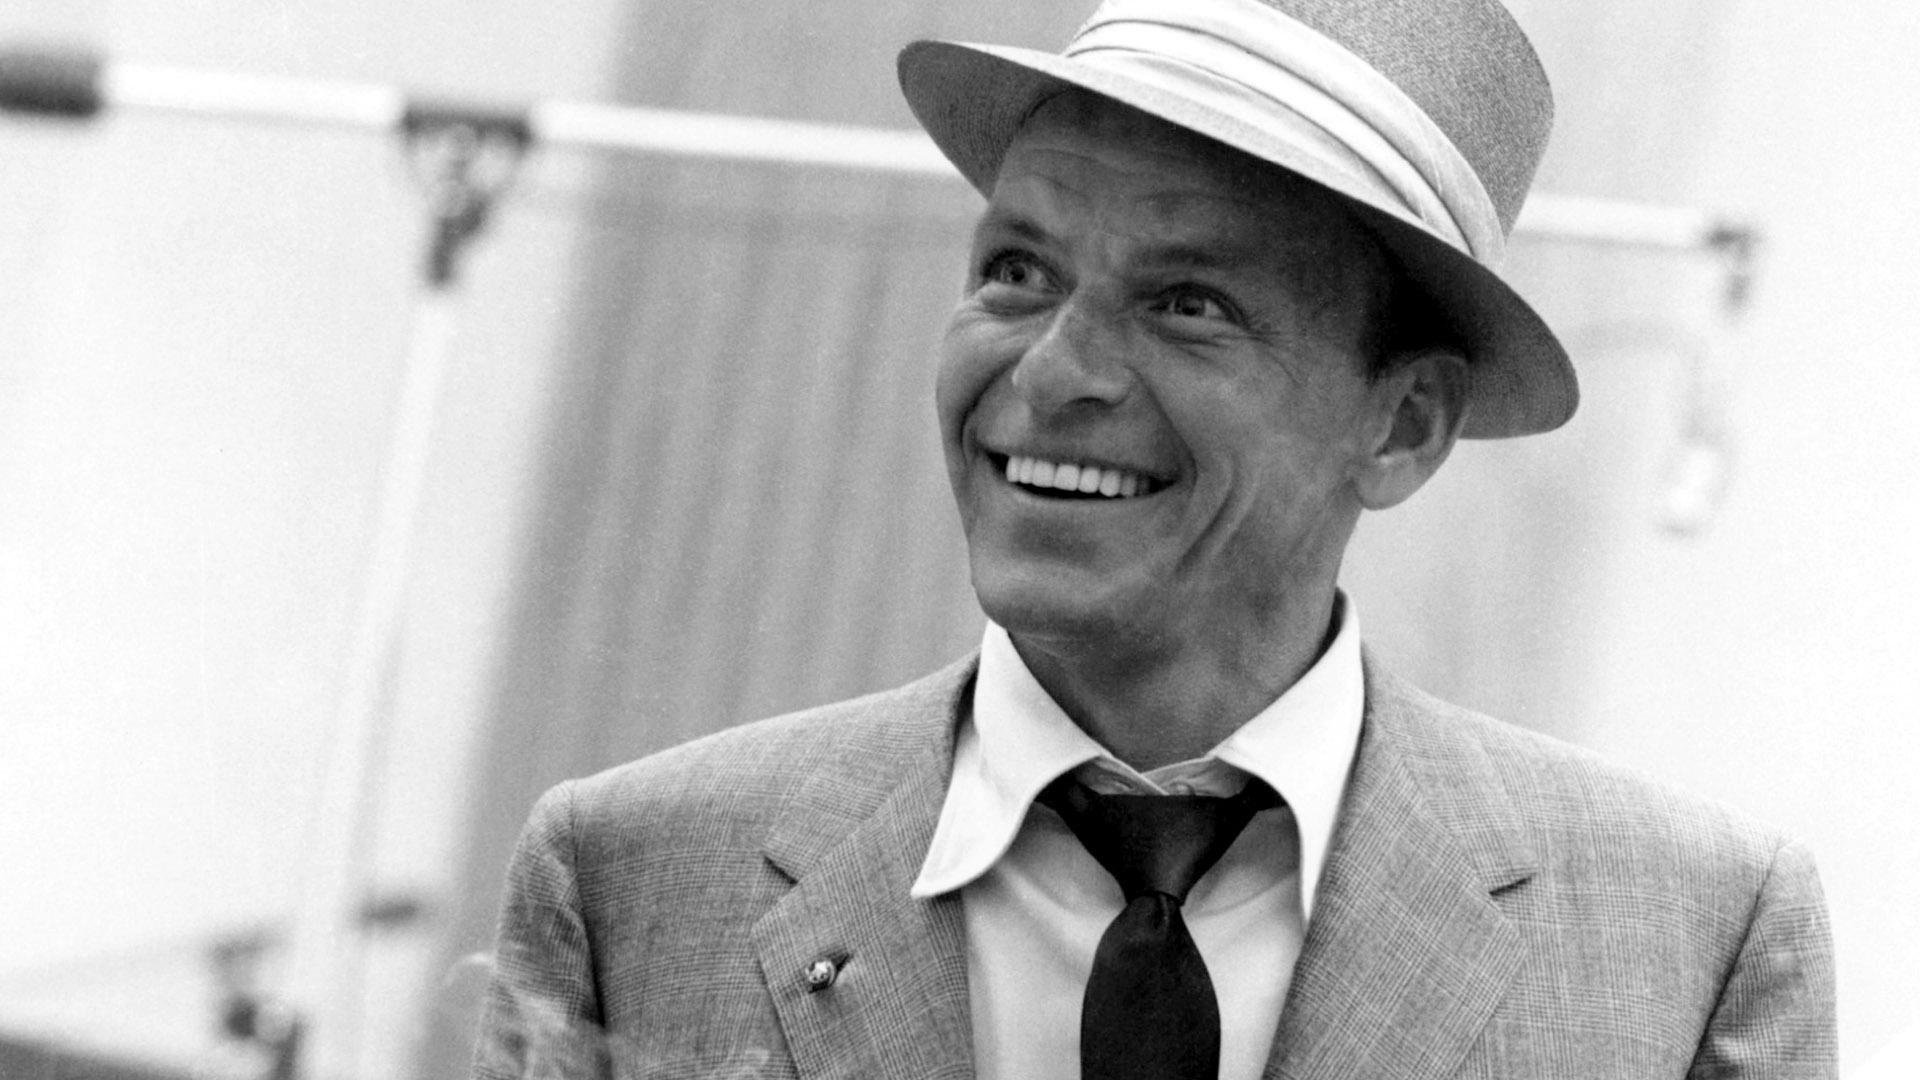 Frank Sinatra Wallpaper 1920x1080 62502